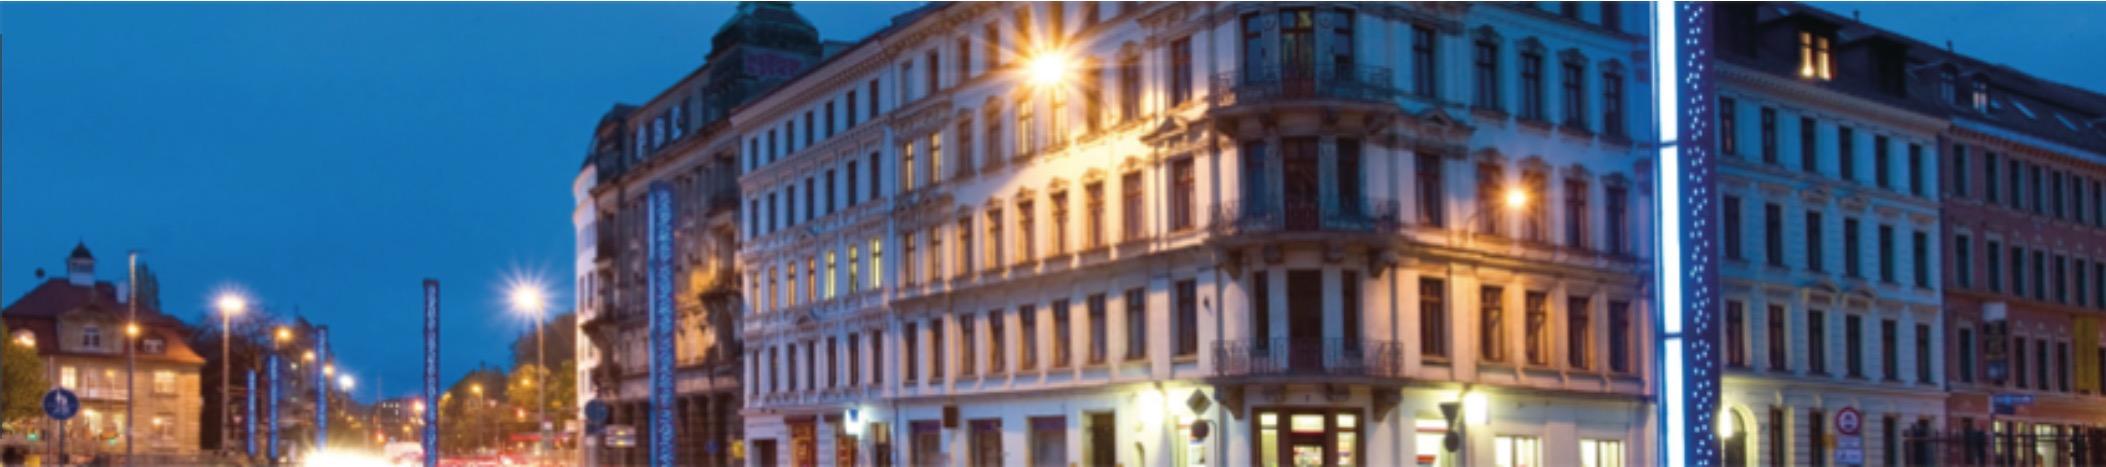 LED Strassenlicht Straßenbeleuchtung e-con GmbH